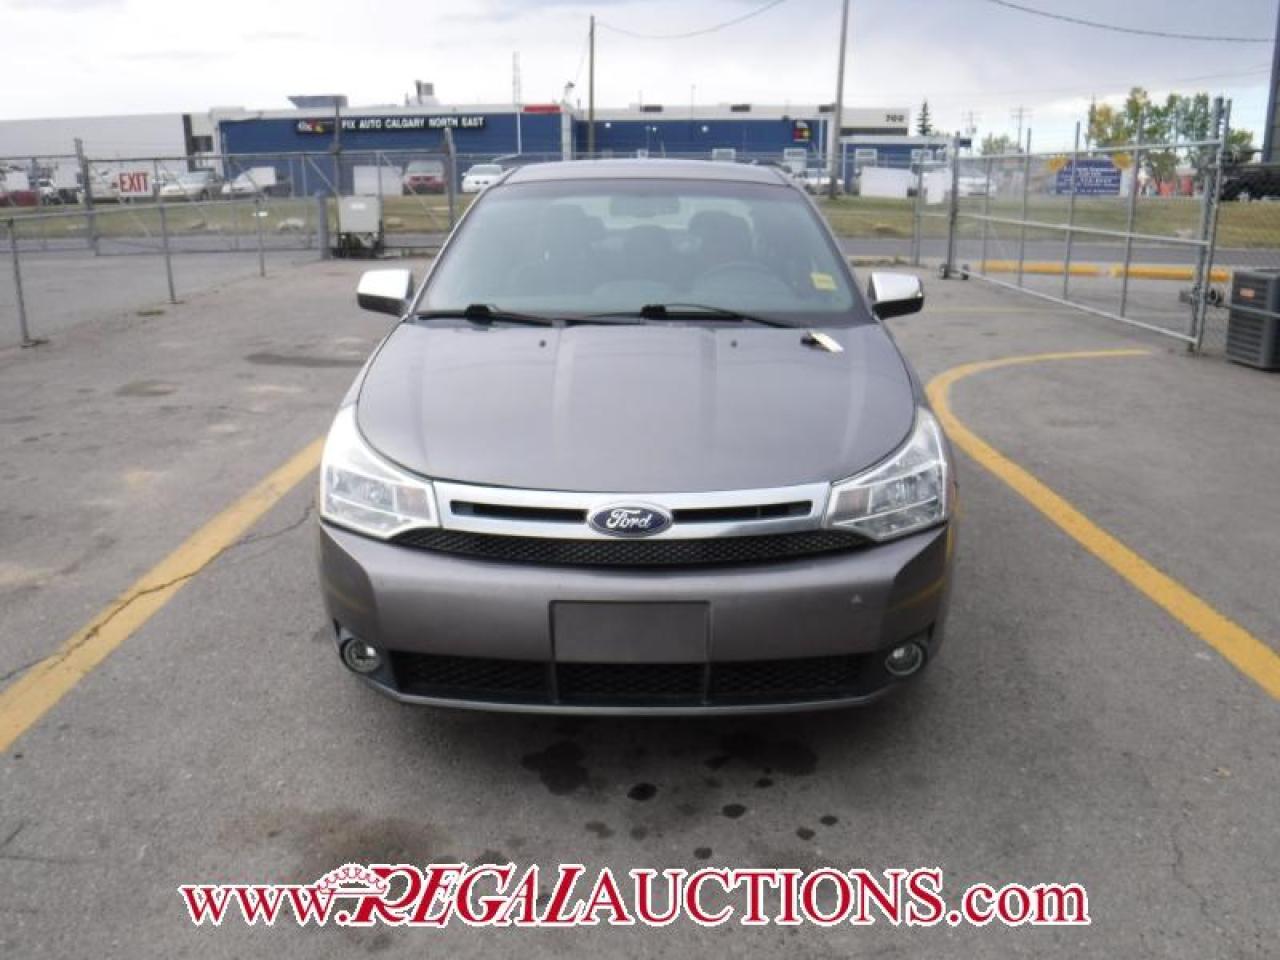 Photo of Dark Grey 2011 Ford Focus